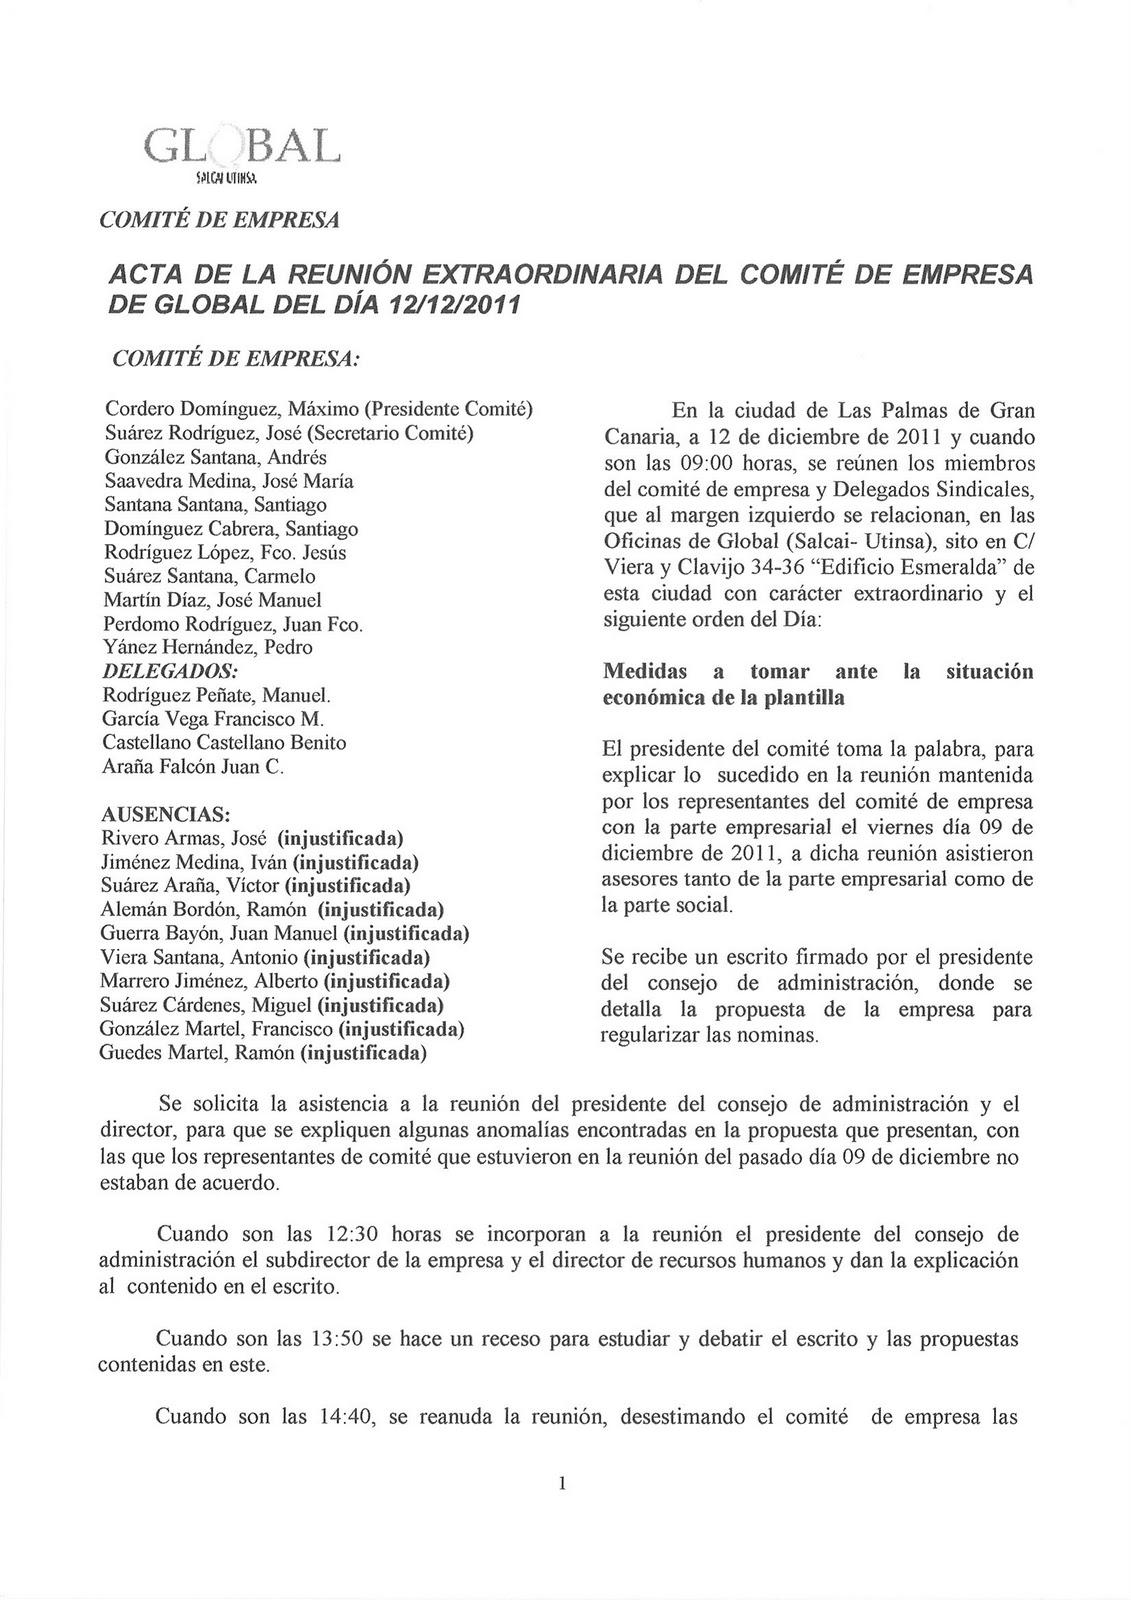 Comité de Empresa Global (Salcai-Utinsa): 2011